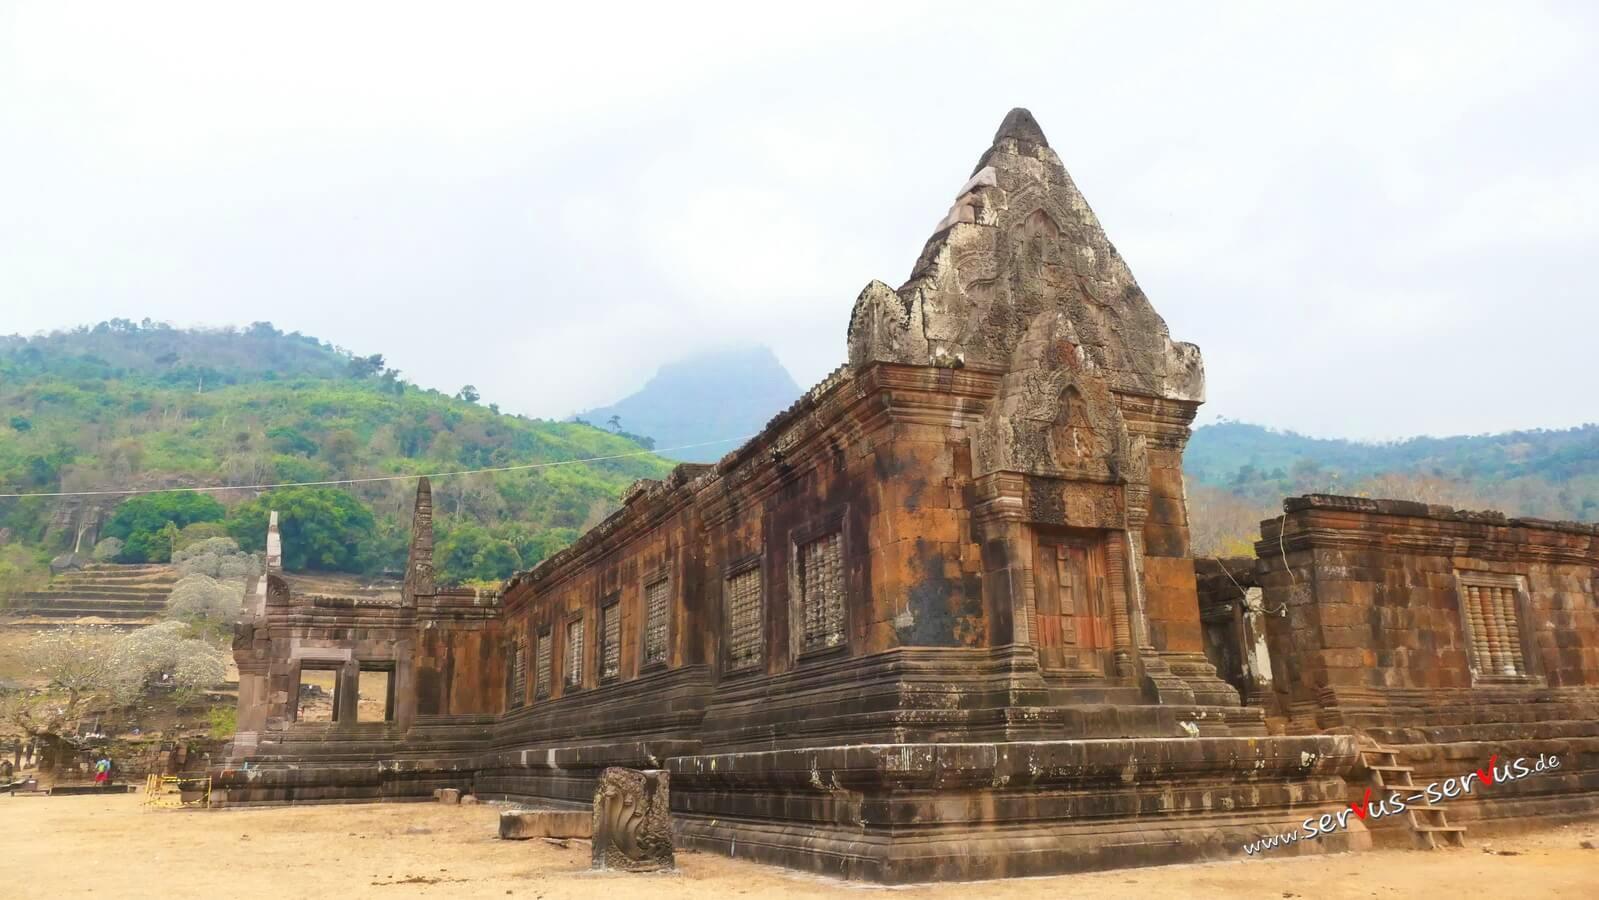 Laos, Champasak, Vat Phou